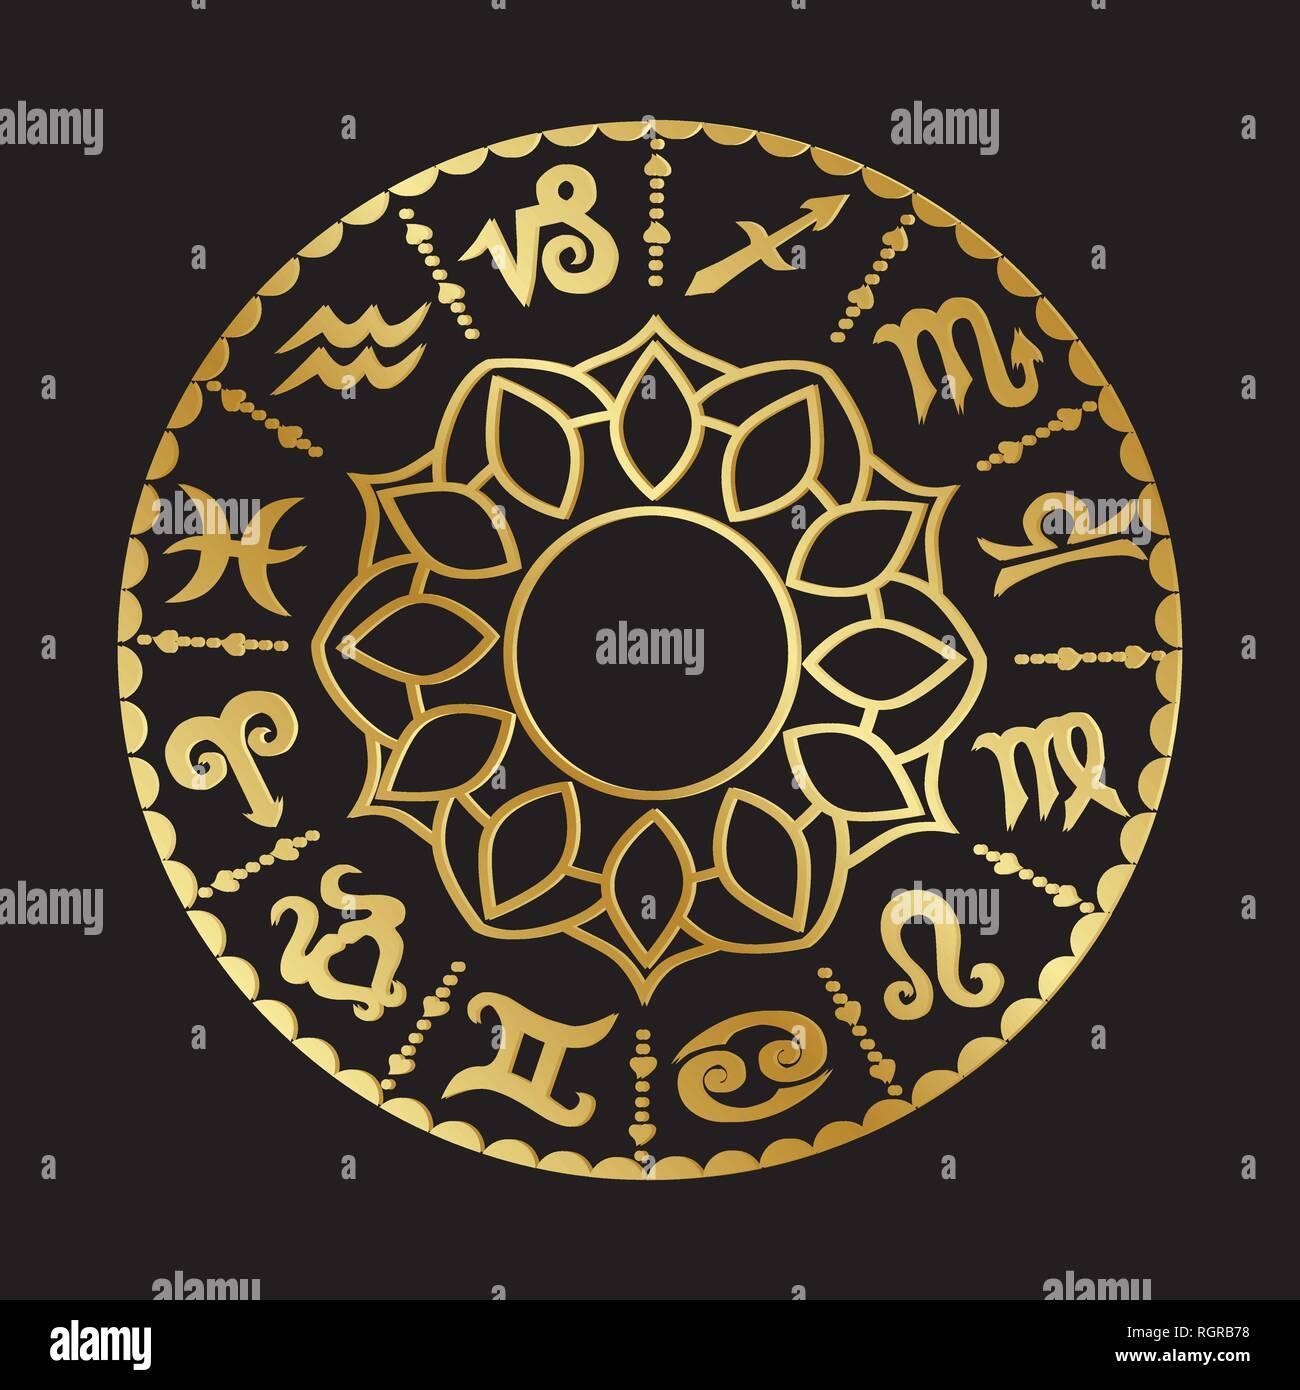 Signos Del Zodiaco Mandala Imagen Vector De Stock Alamy